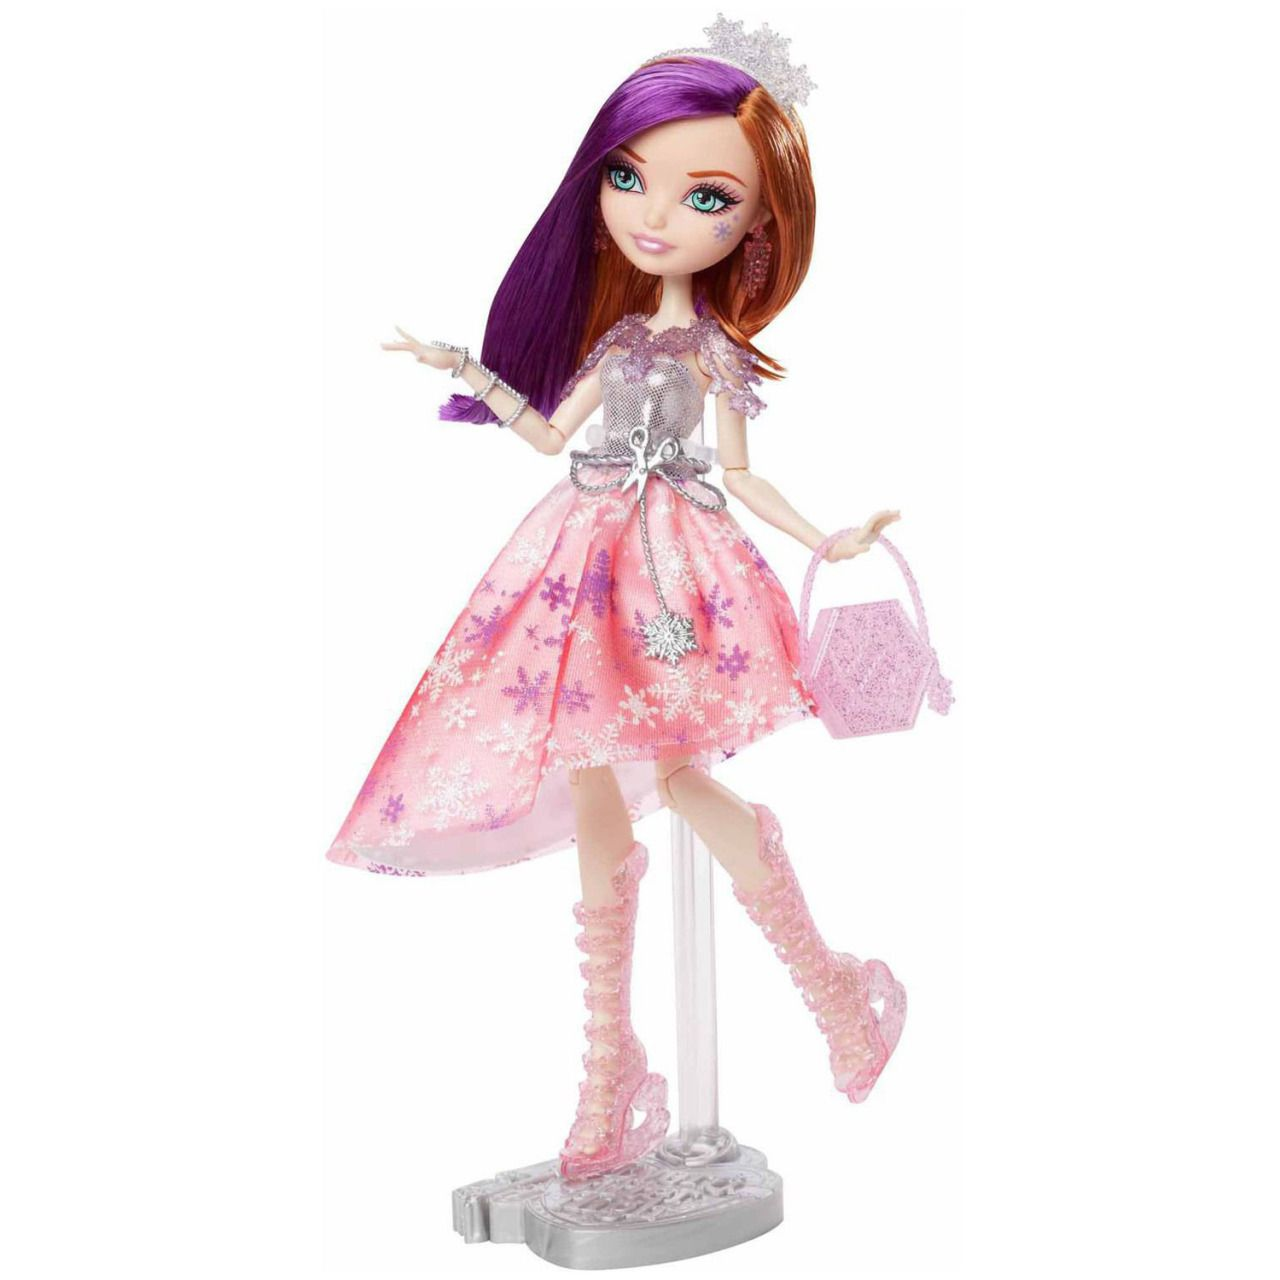 Poppy O Hair Fairest On Ice Doll Mattel Bonecas Coisas Criativas